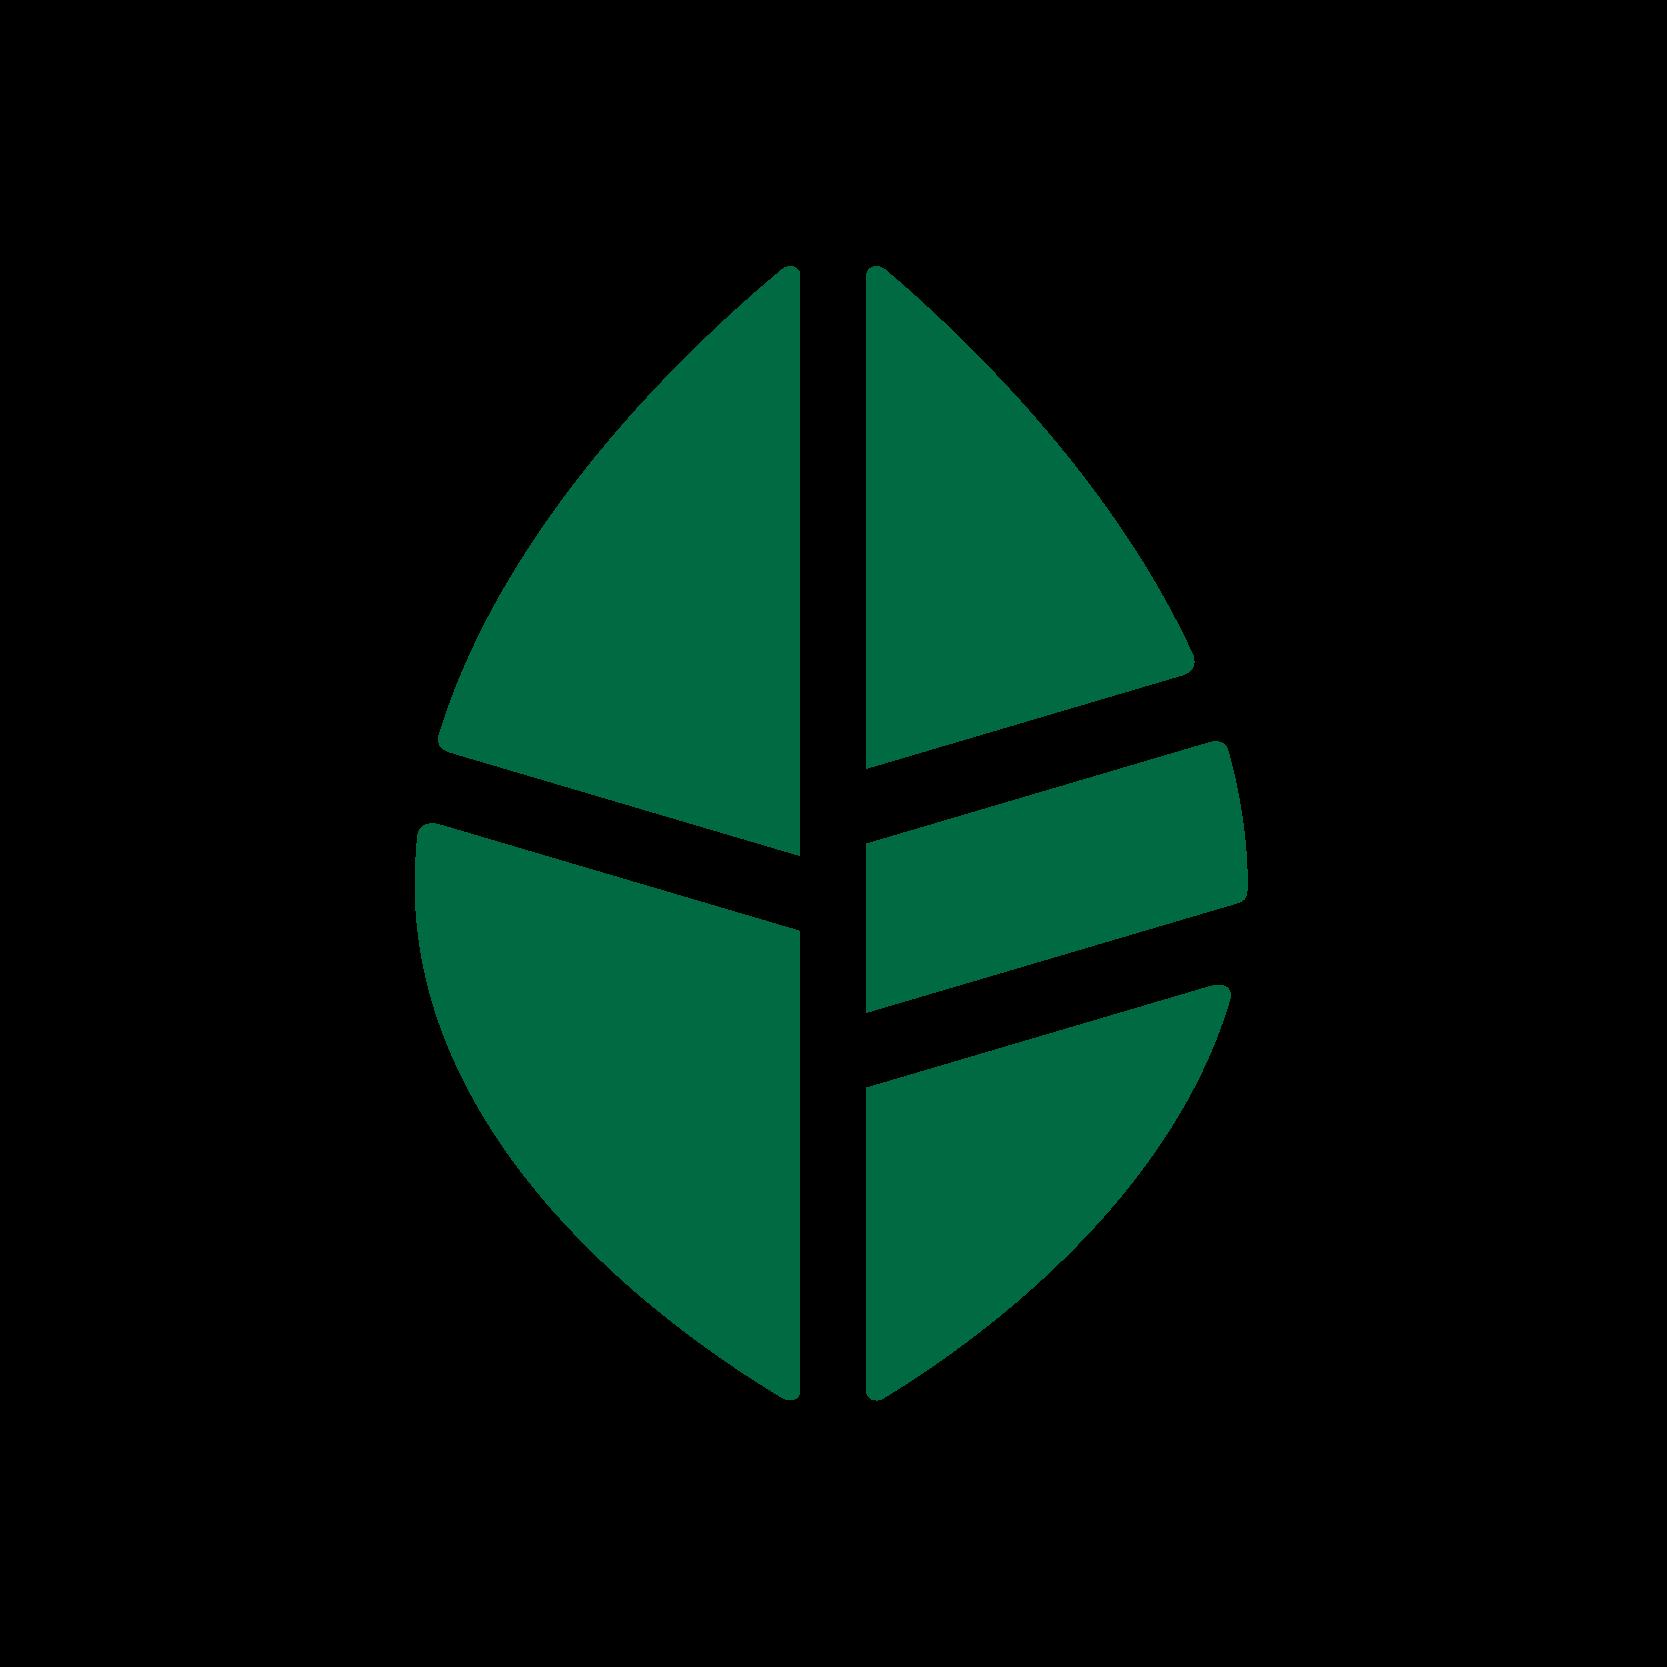 TF_Leaf_icon_400px_300dpi_Forest_Green_rgb.png